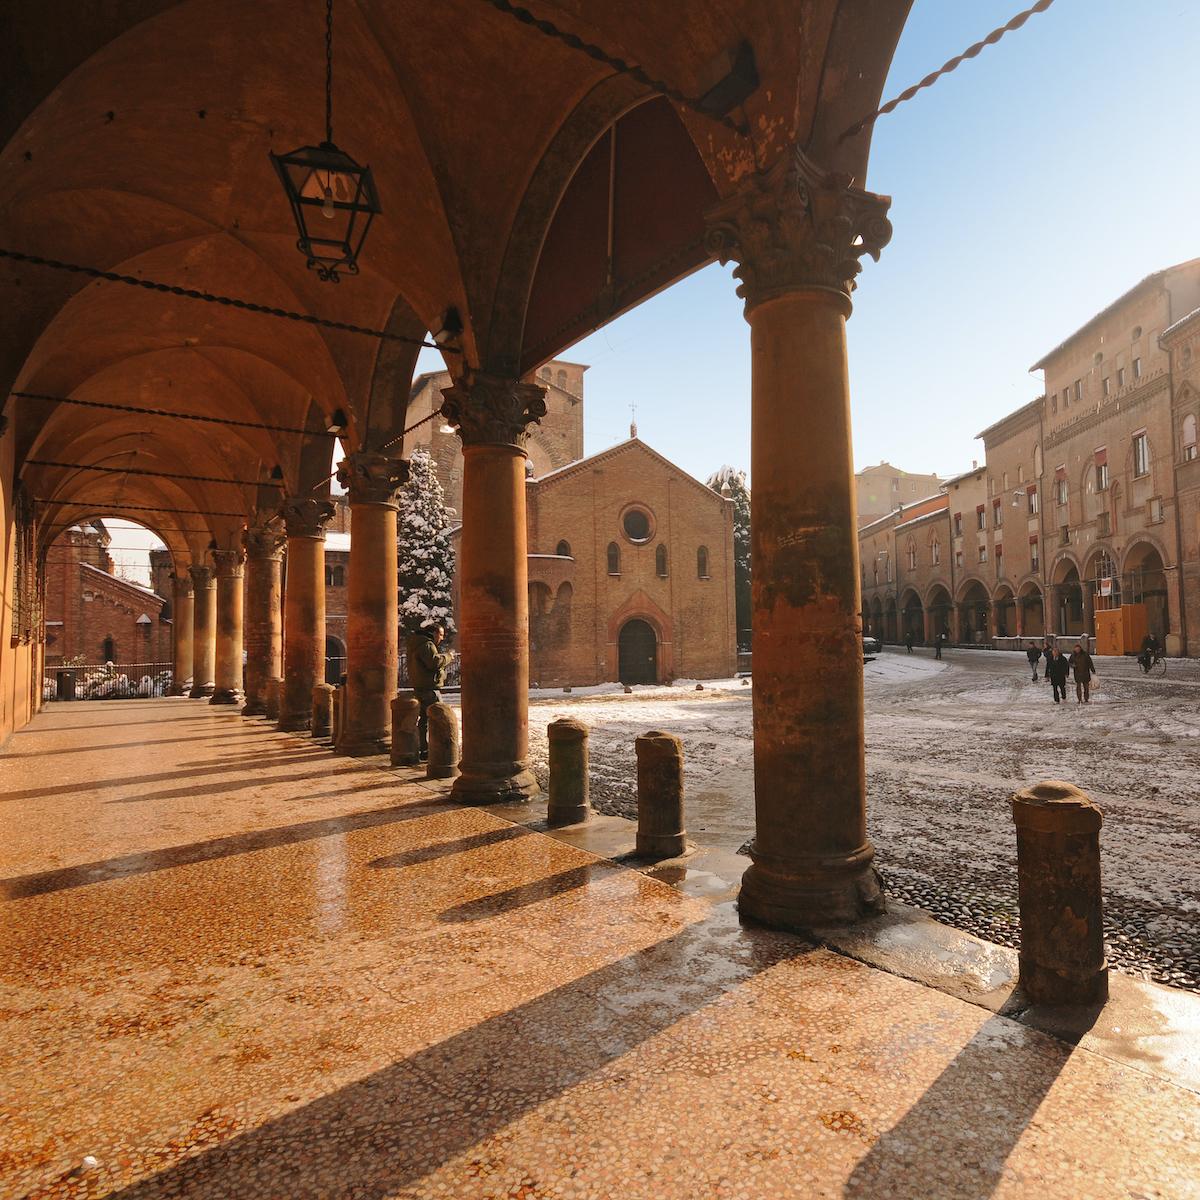 Porticoes of Bologna, Italy